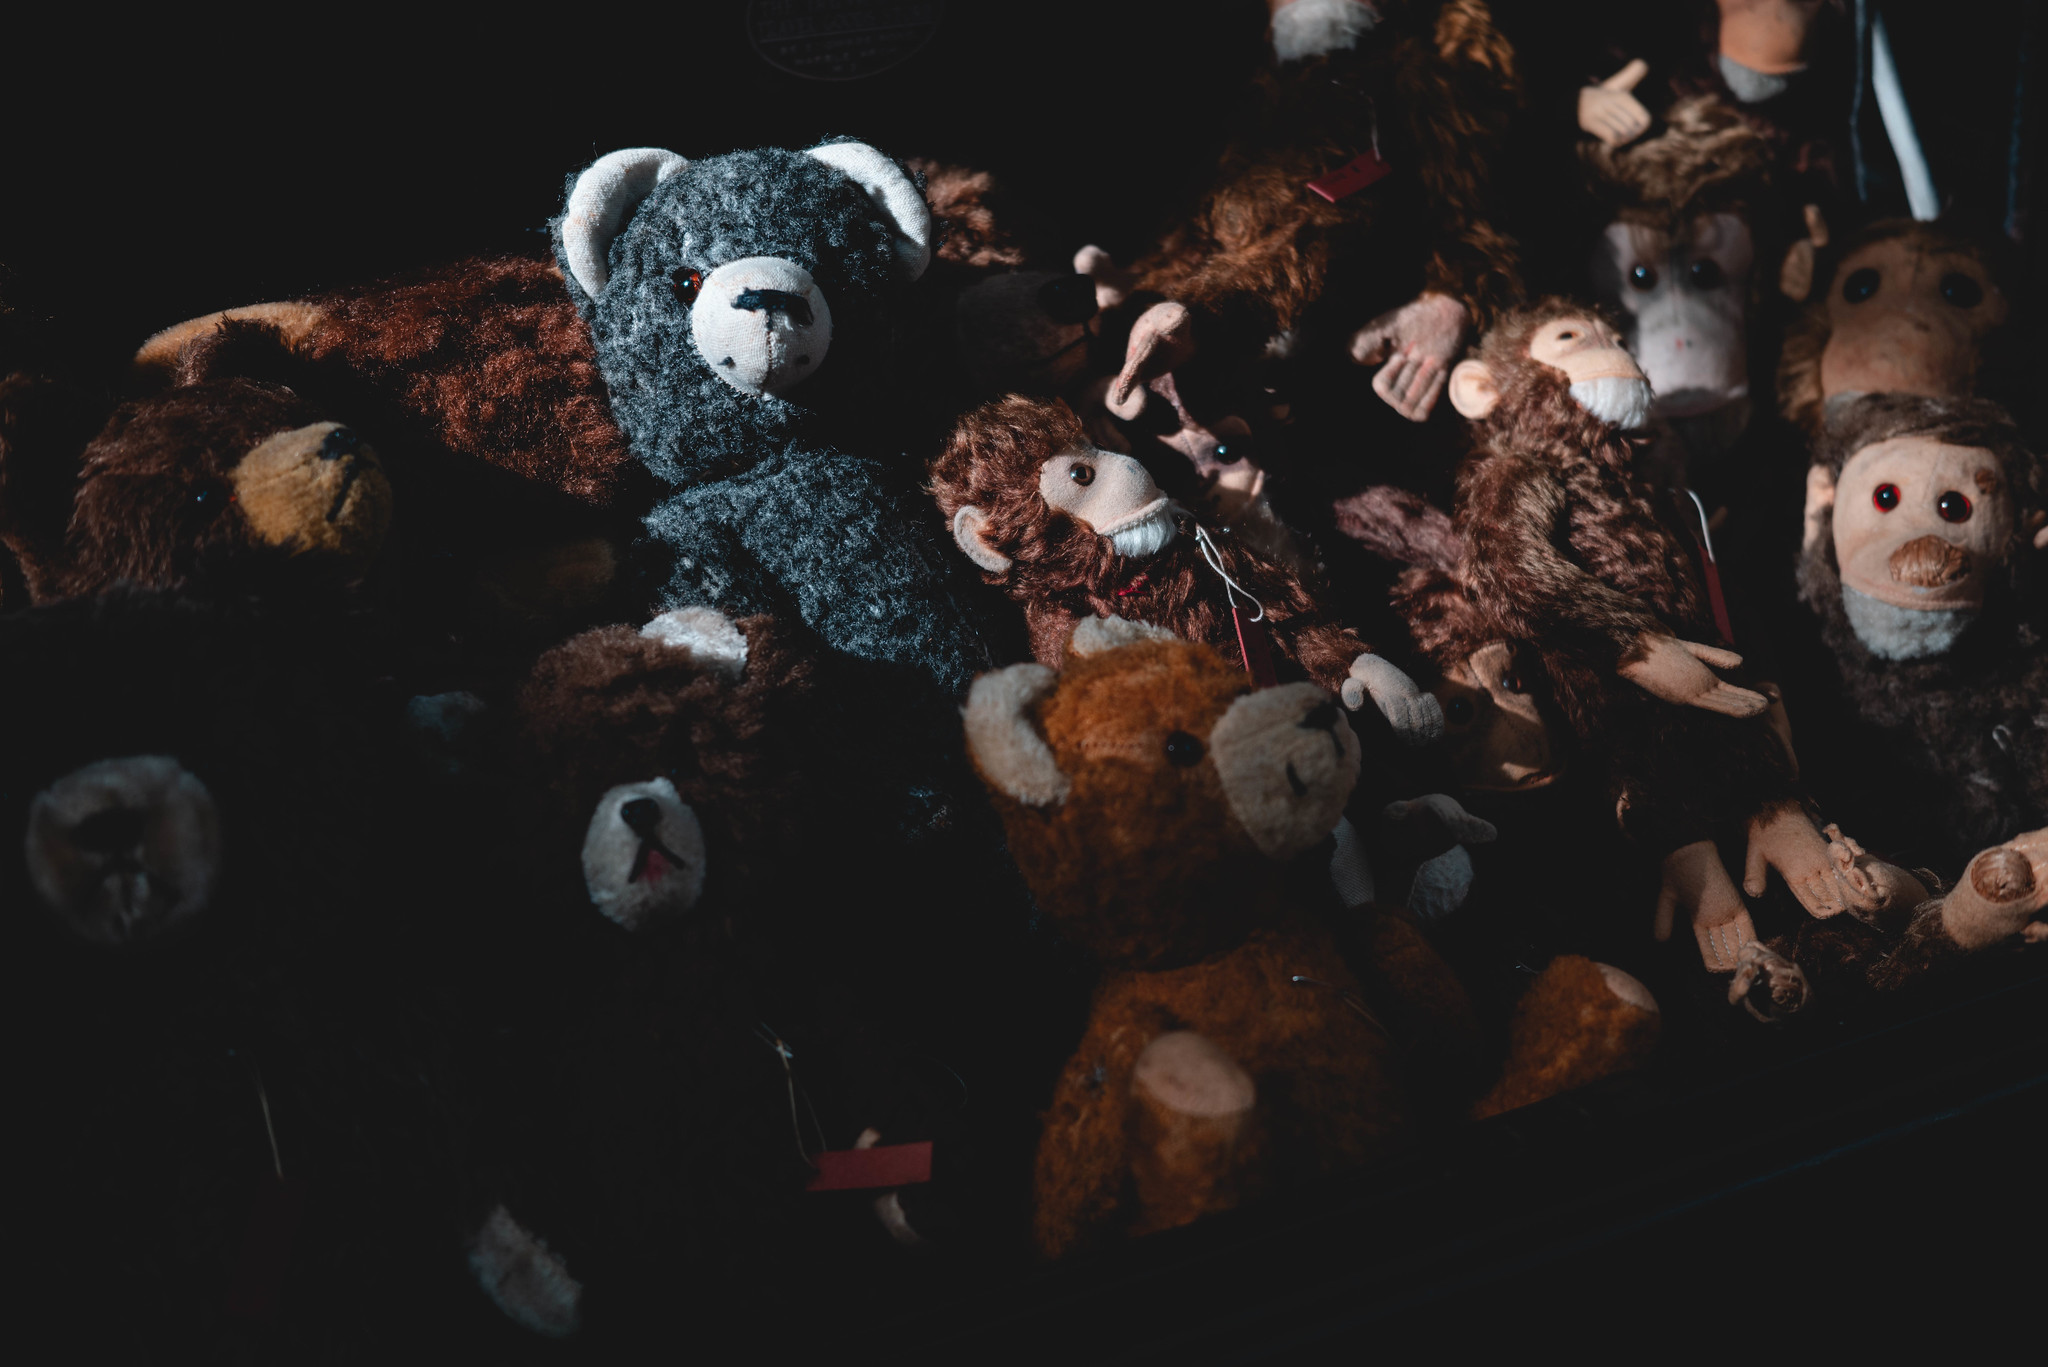 old stuffed animals